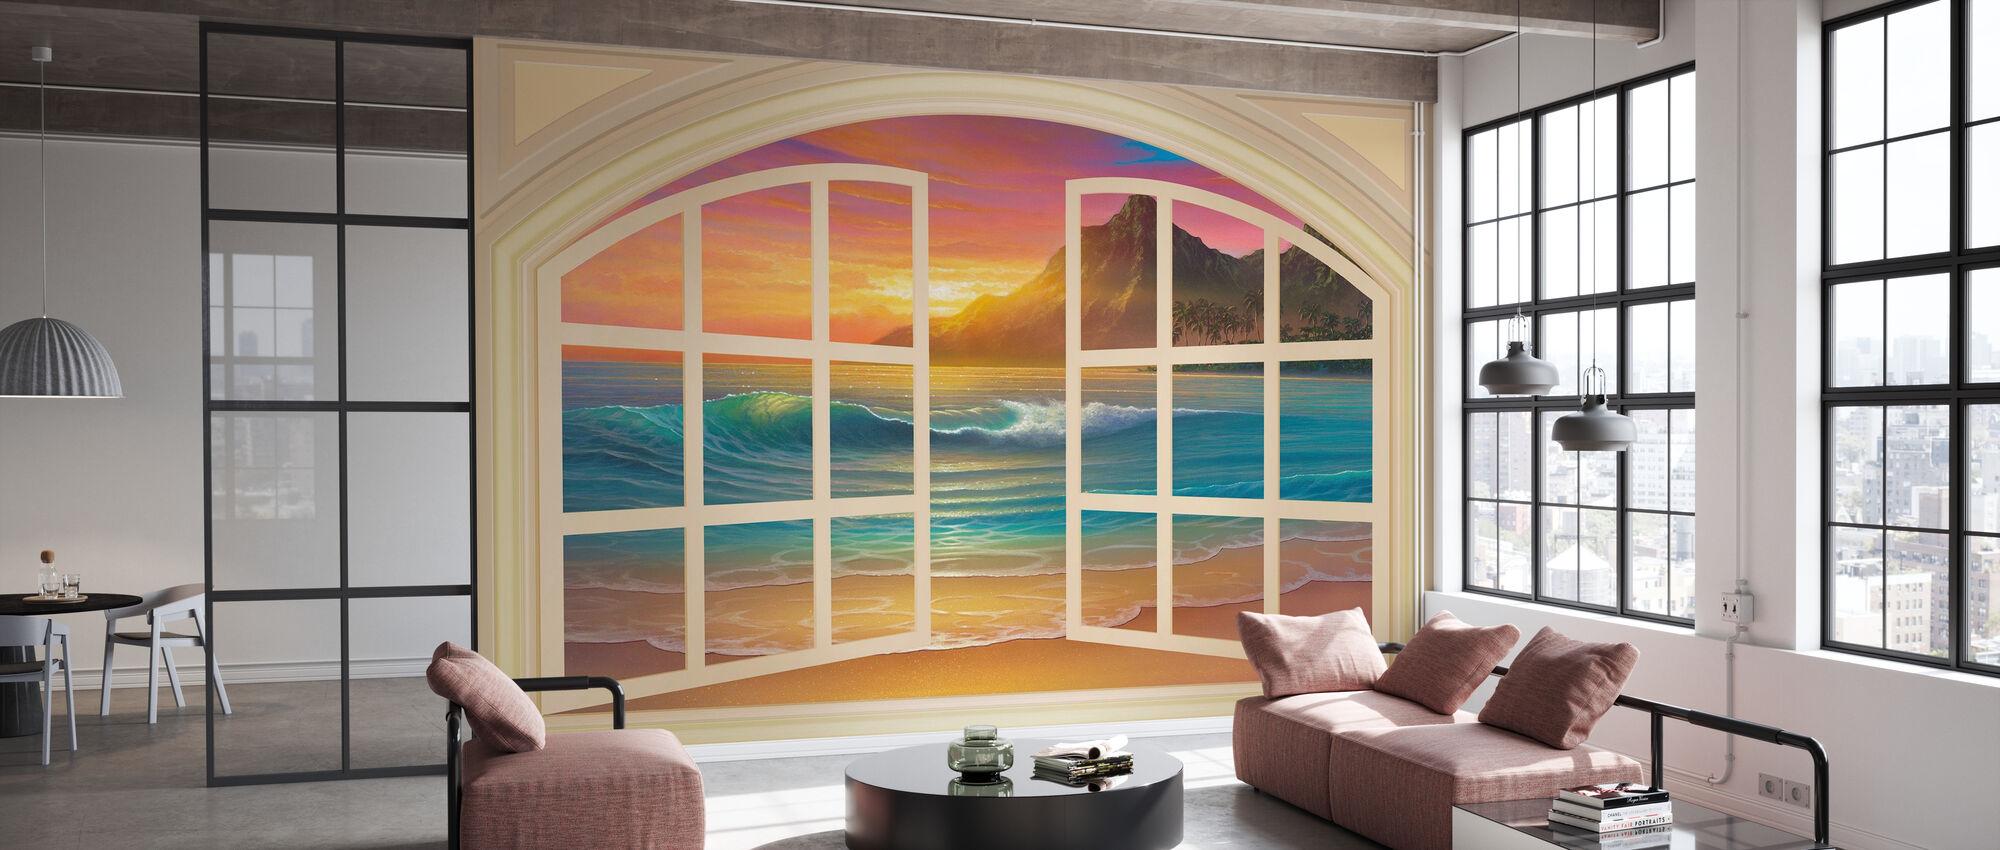 Golden Sunset genom fönster - Tapet - Kontor